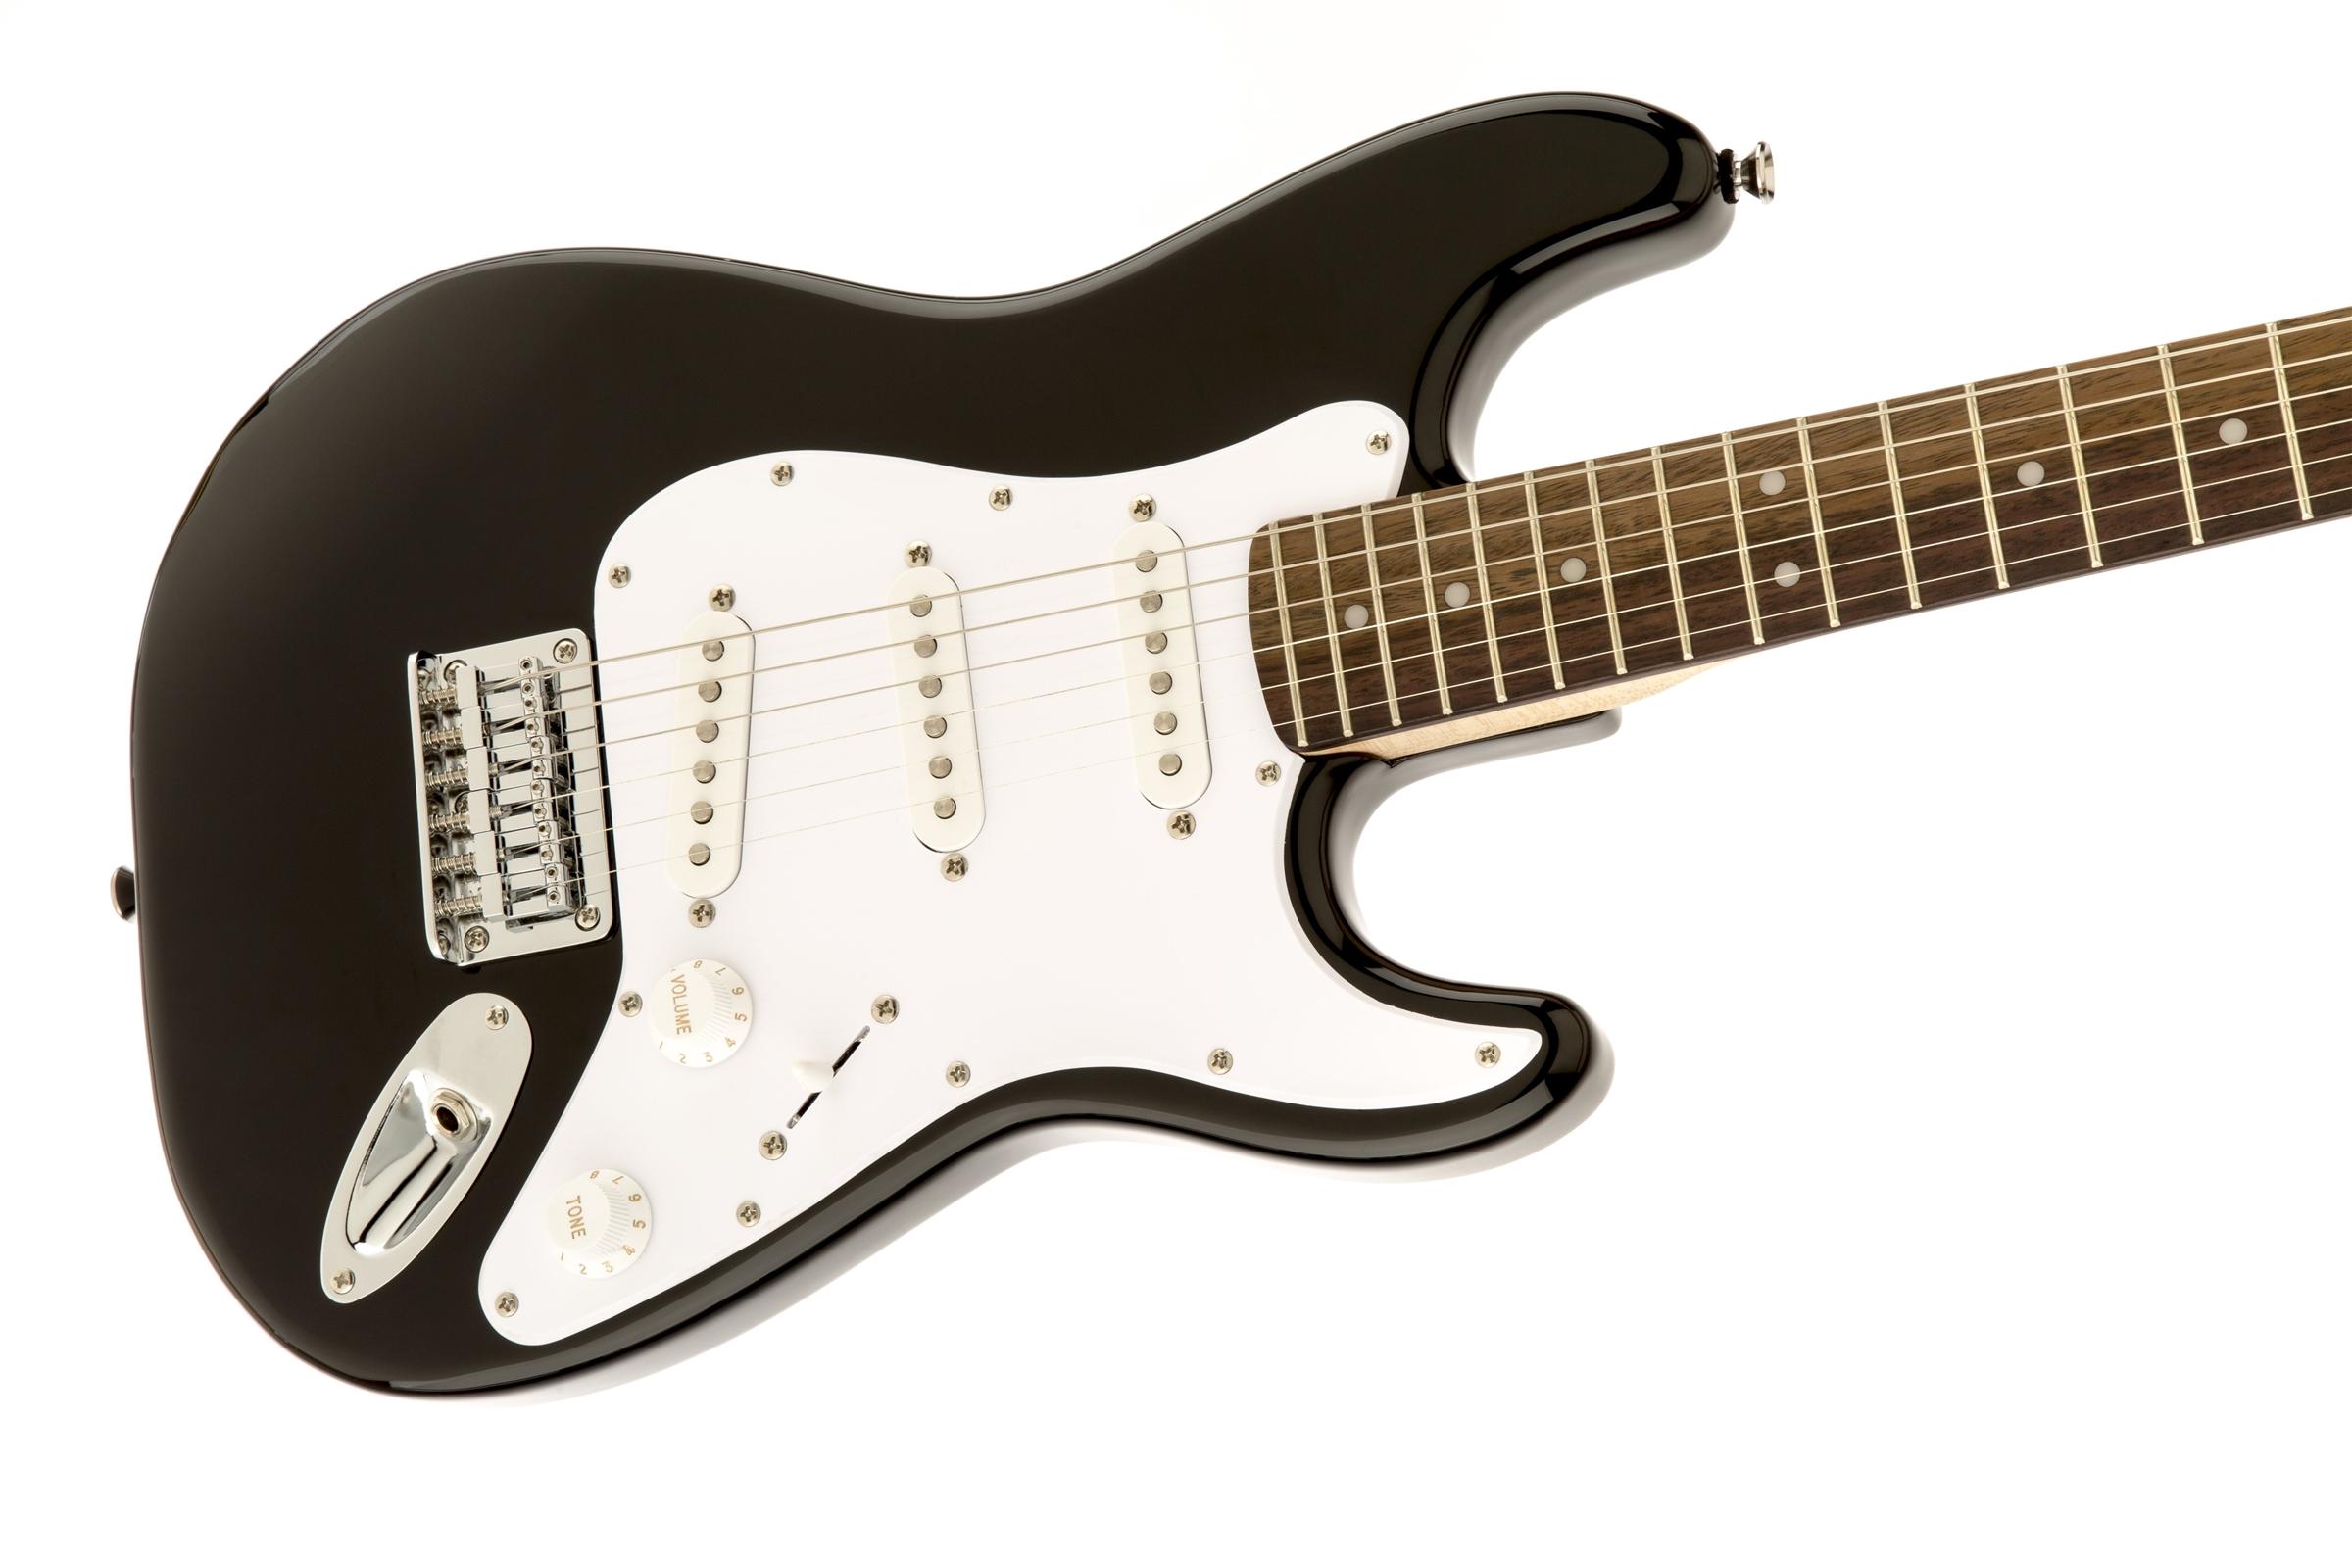 squier by fender mini strat electric guitar black w amp 717669176846 ebay. Black Bedroom Furniture Sets. Home Design Ideas